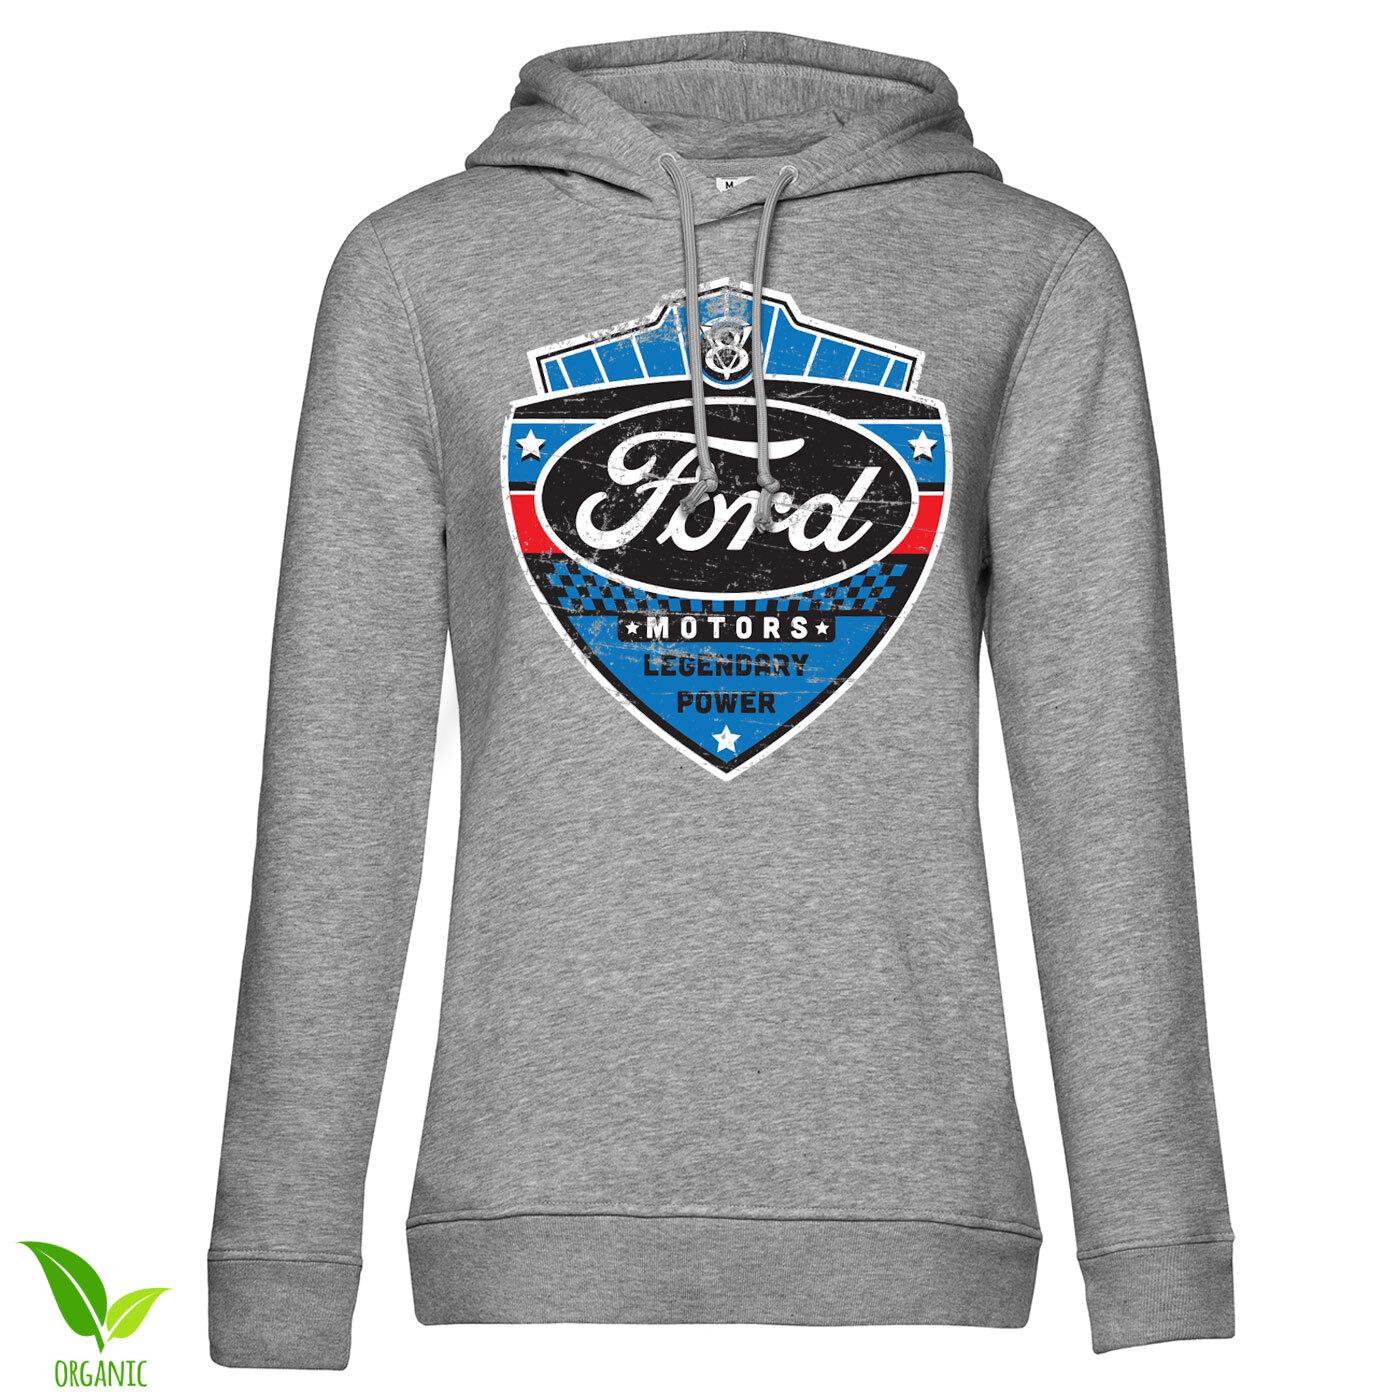 Ford - Legendary Power Girls Hoodie